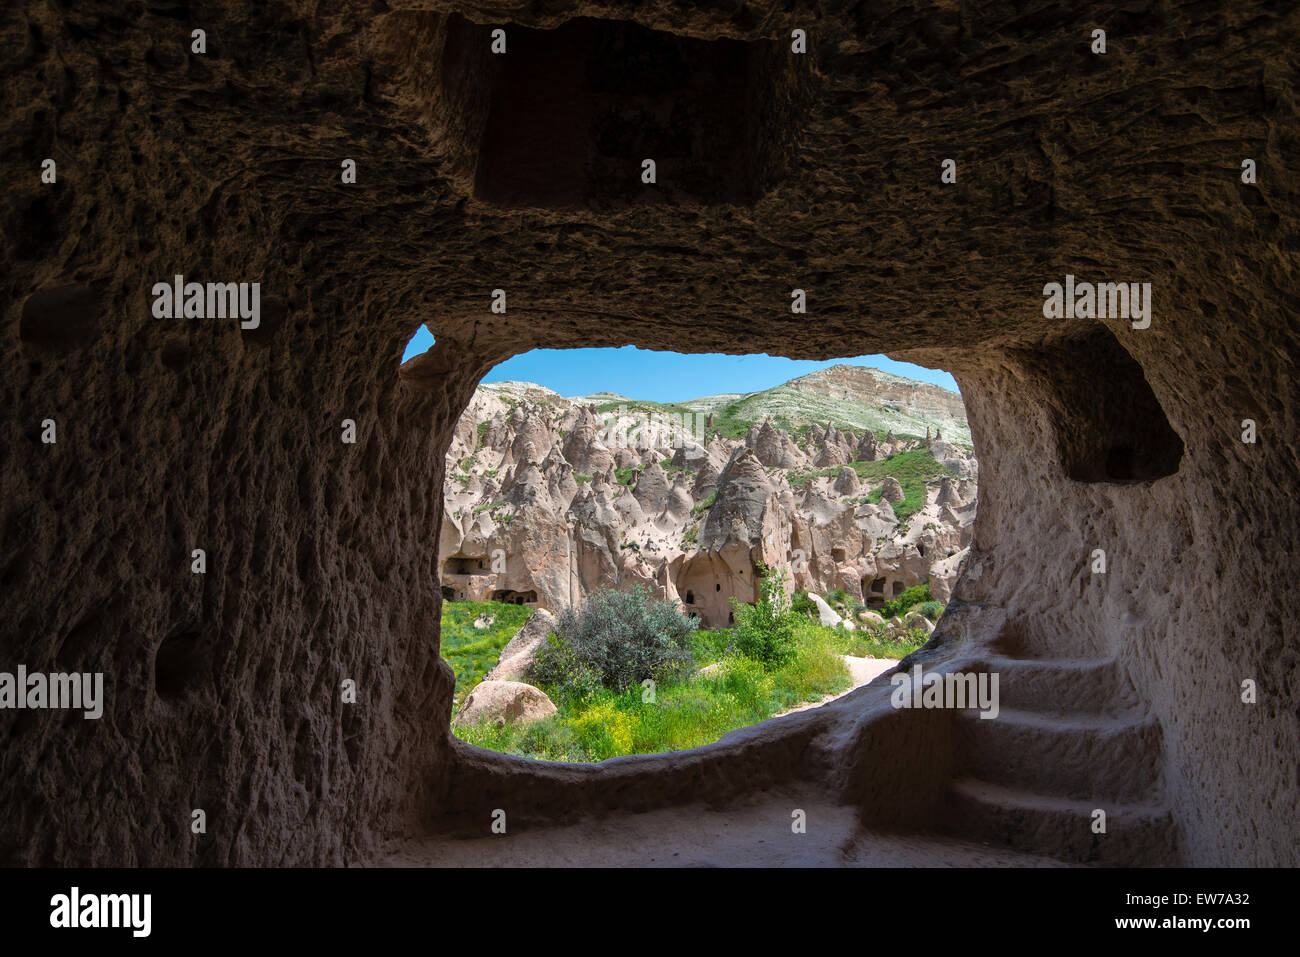 The abandoned rock carved village of Zelve, Zelve open air museum, Cappadocia, Turkey - Stock Image